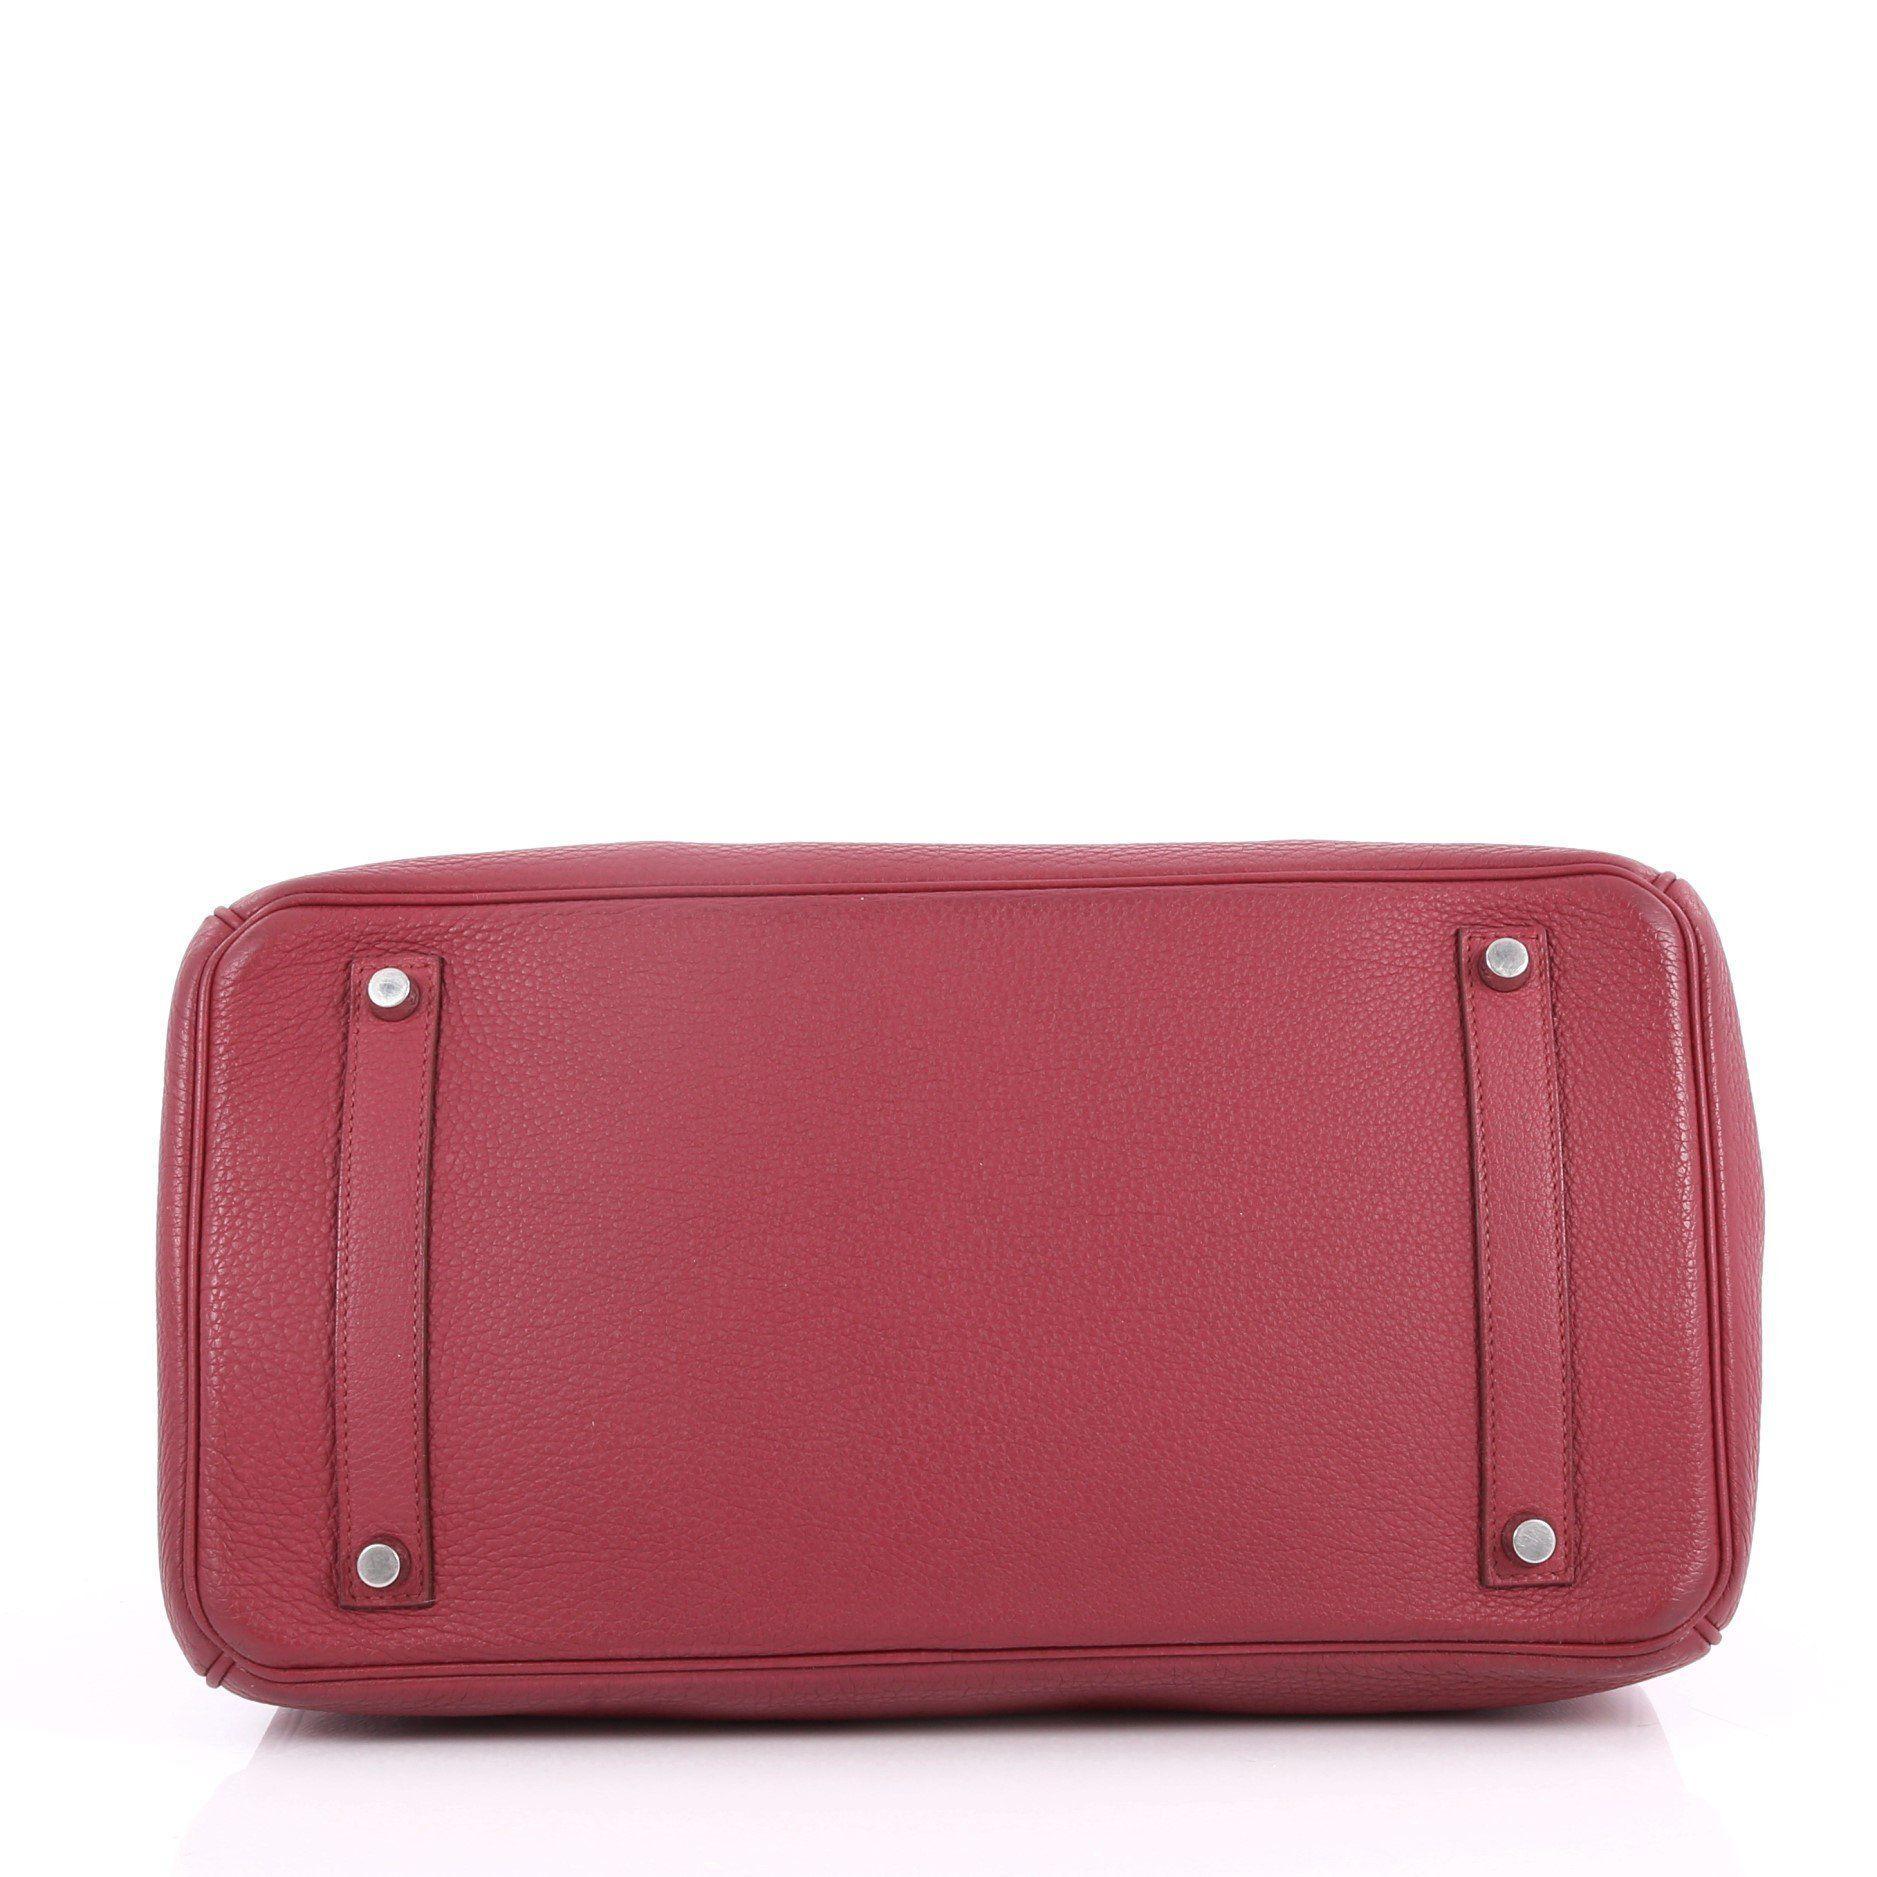 0f171634de957 Hermès - Red Pre Owned Birkin Handbag Rubis Togo With Palladium Hardware 35  - Lyst. View fullscreen